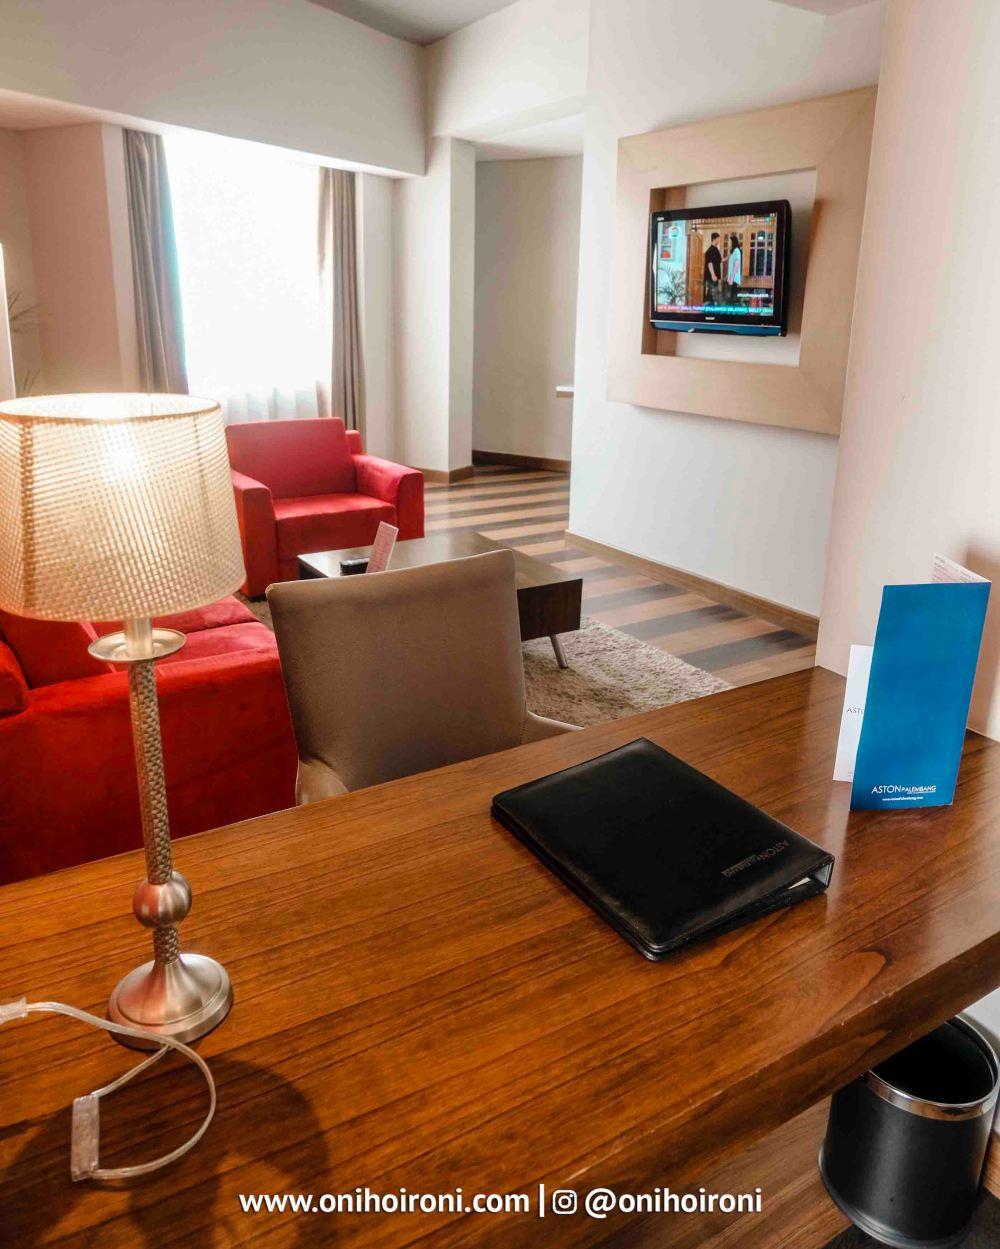 5 Room Executive Suite Aston palembang